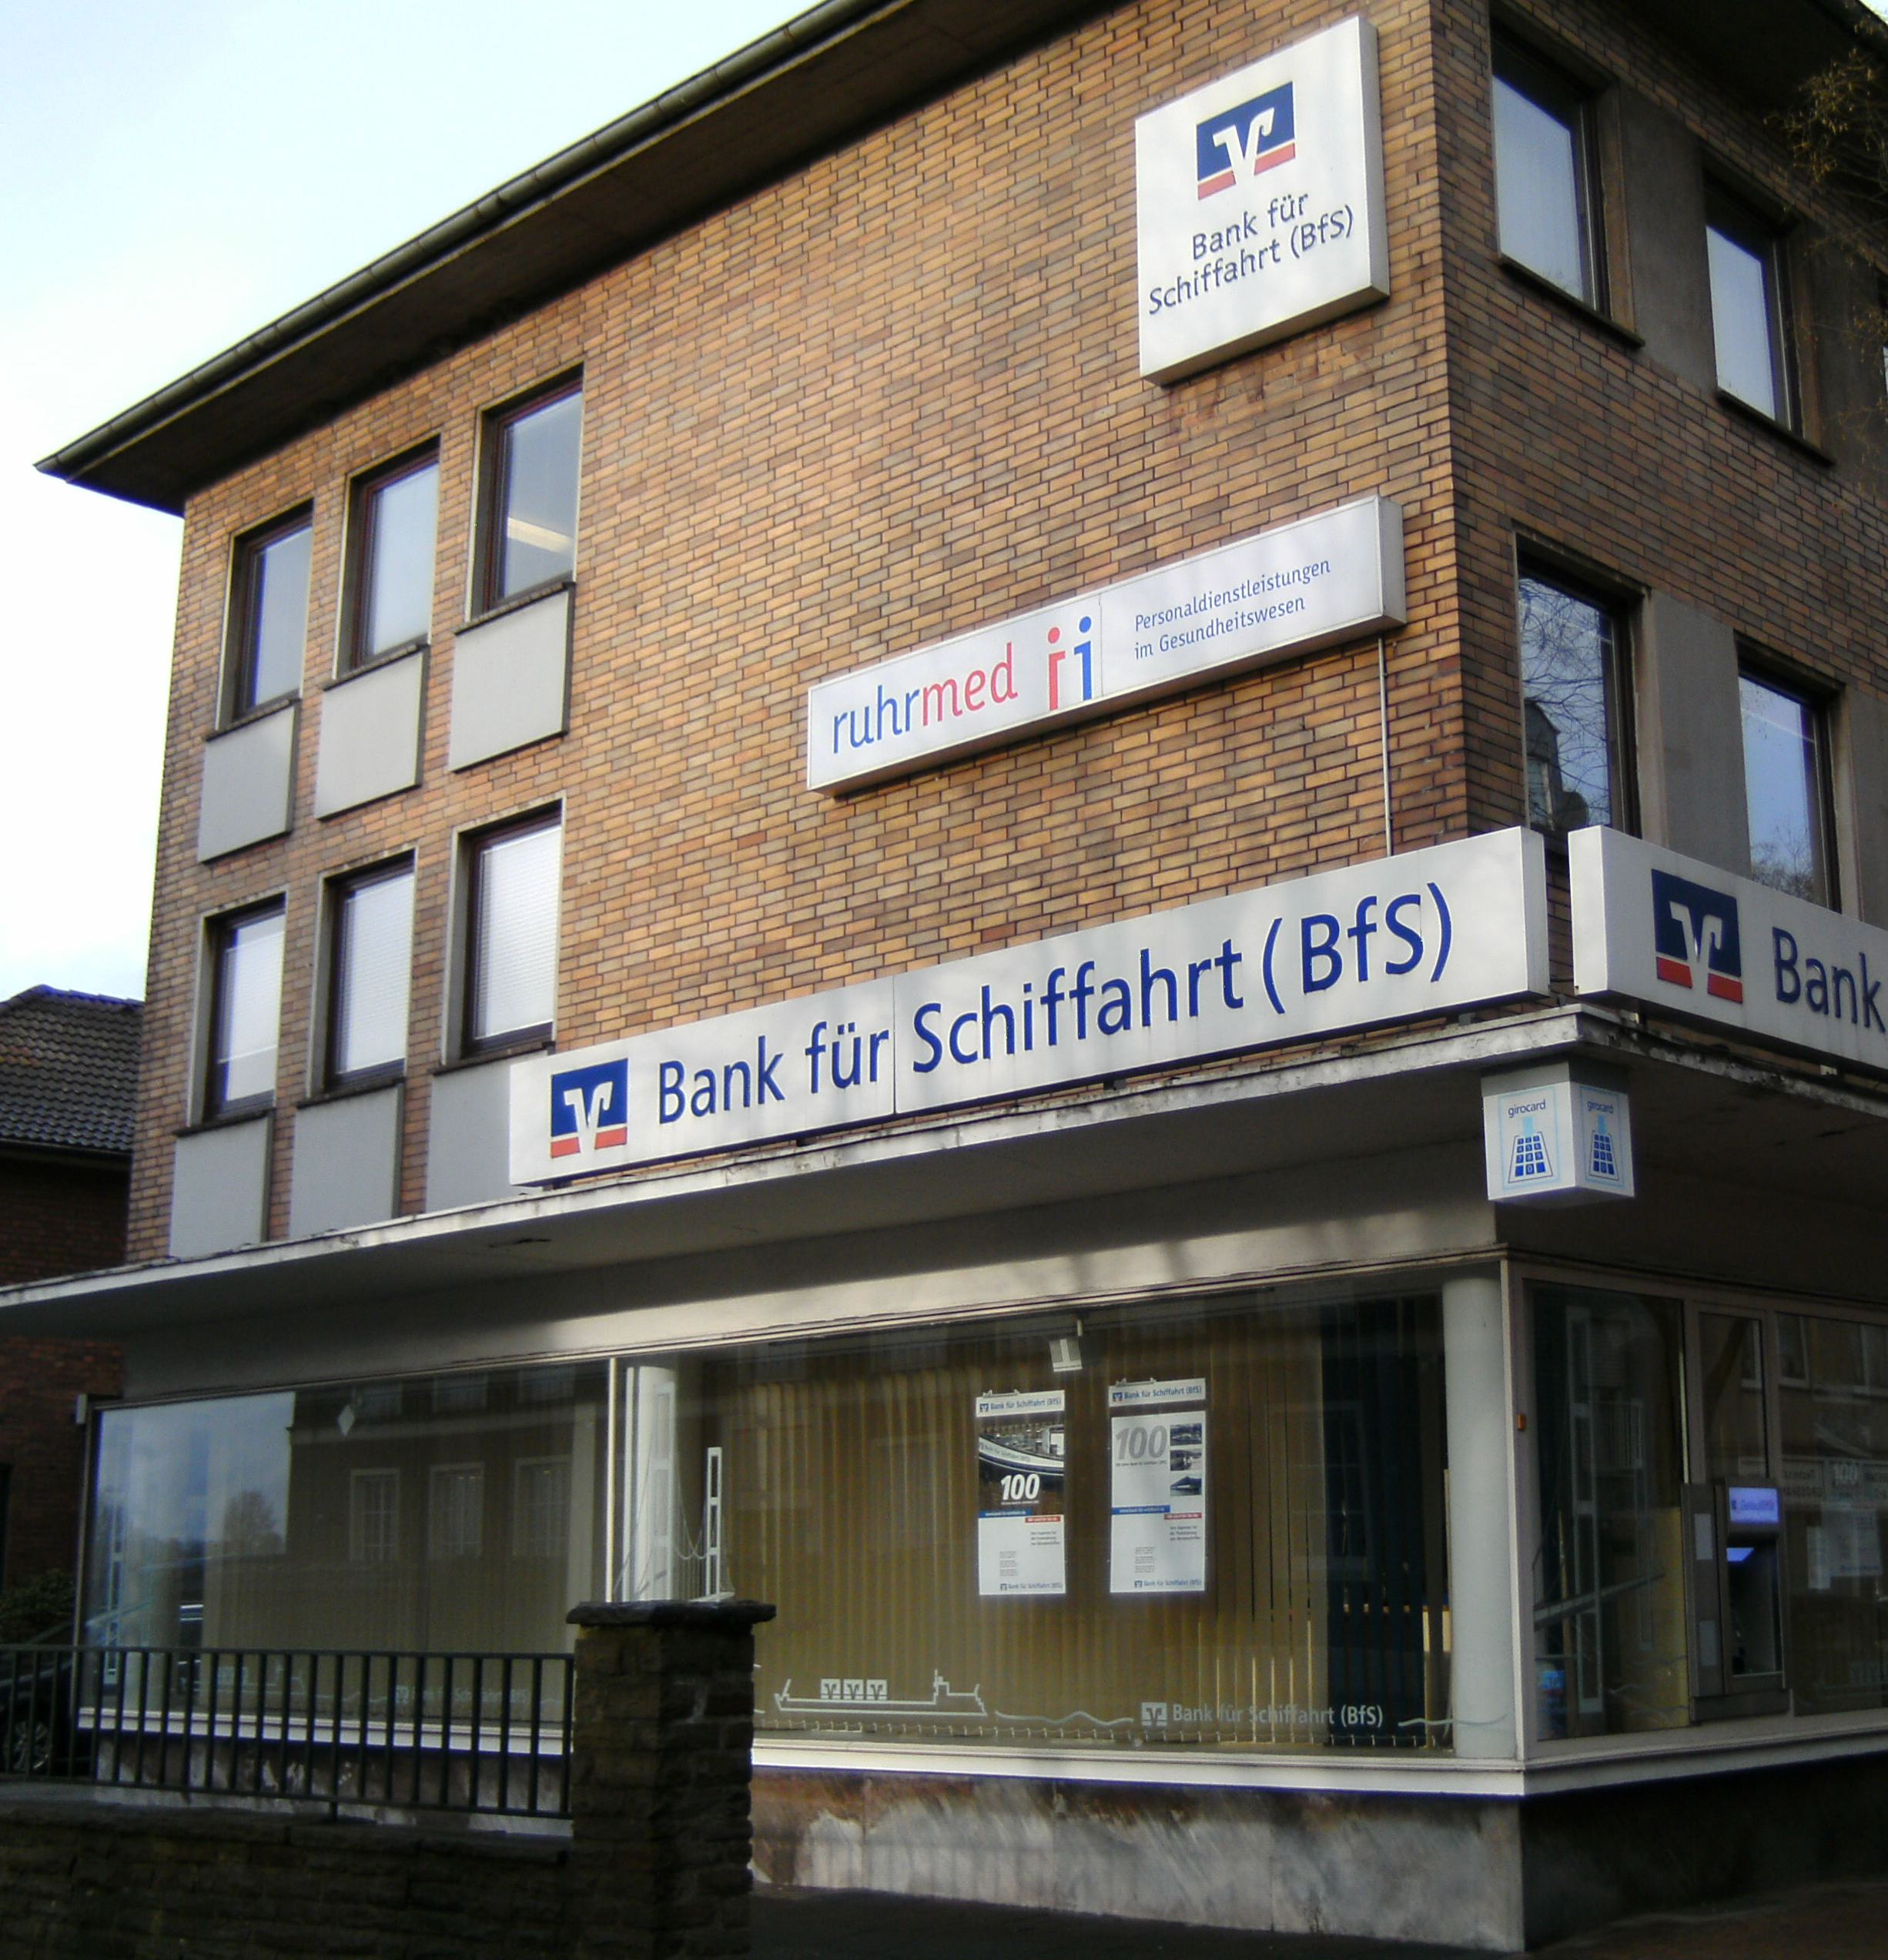 Foto de Bank für Schiffahrt (BfS) - Geschäftsstelle Duisburg